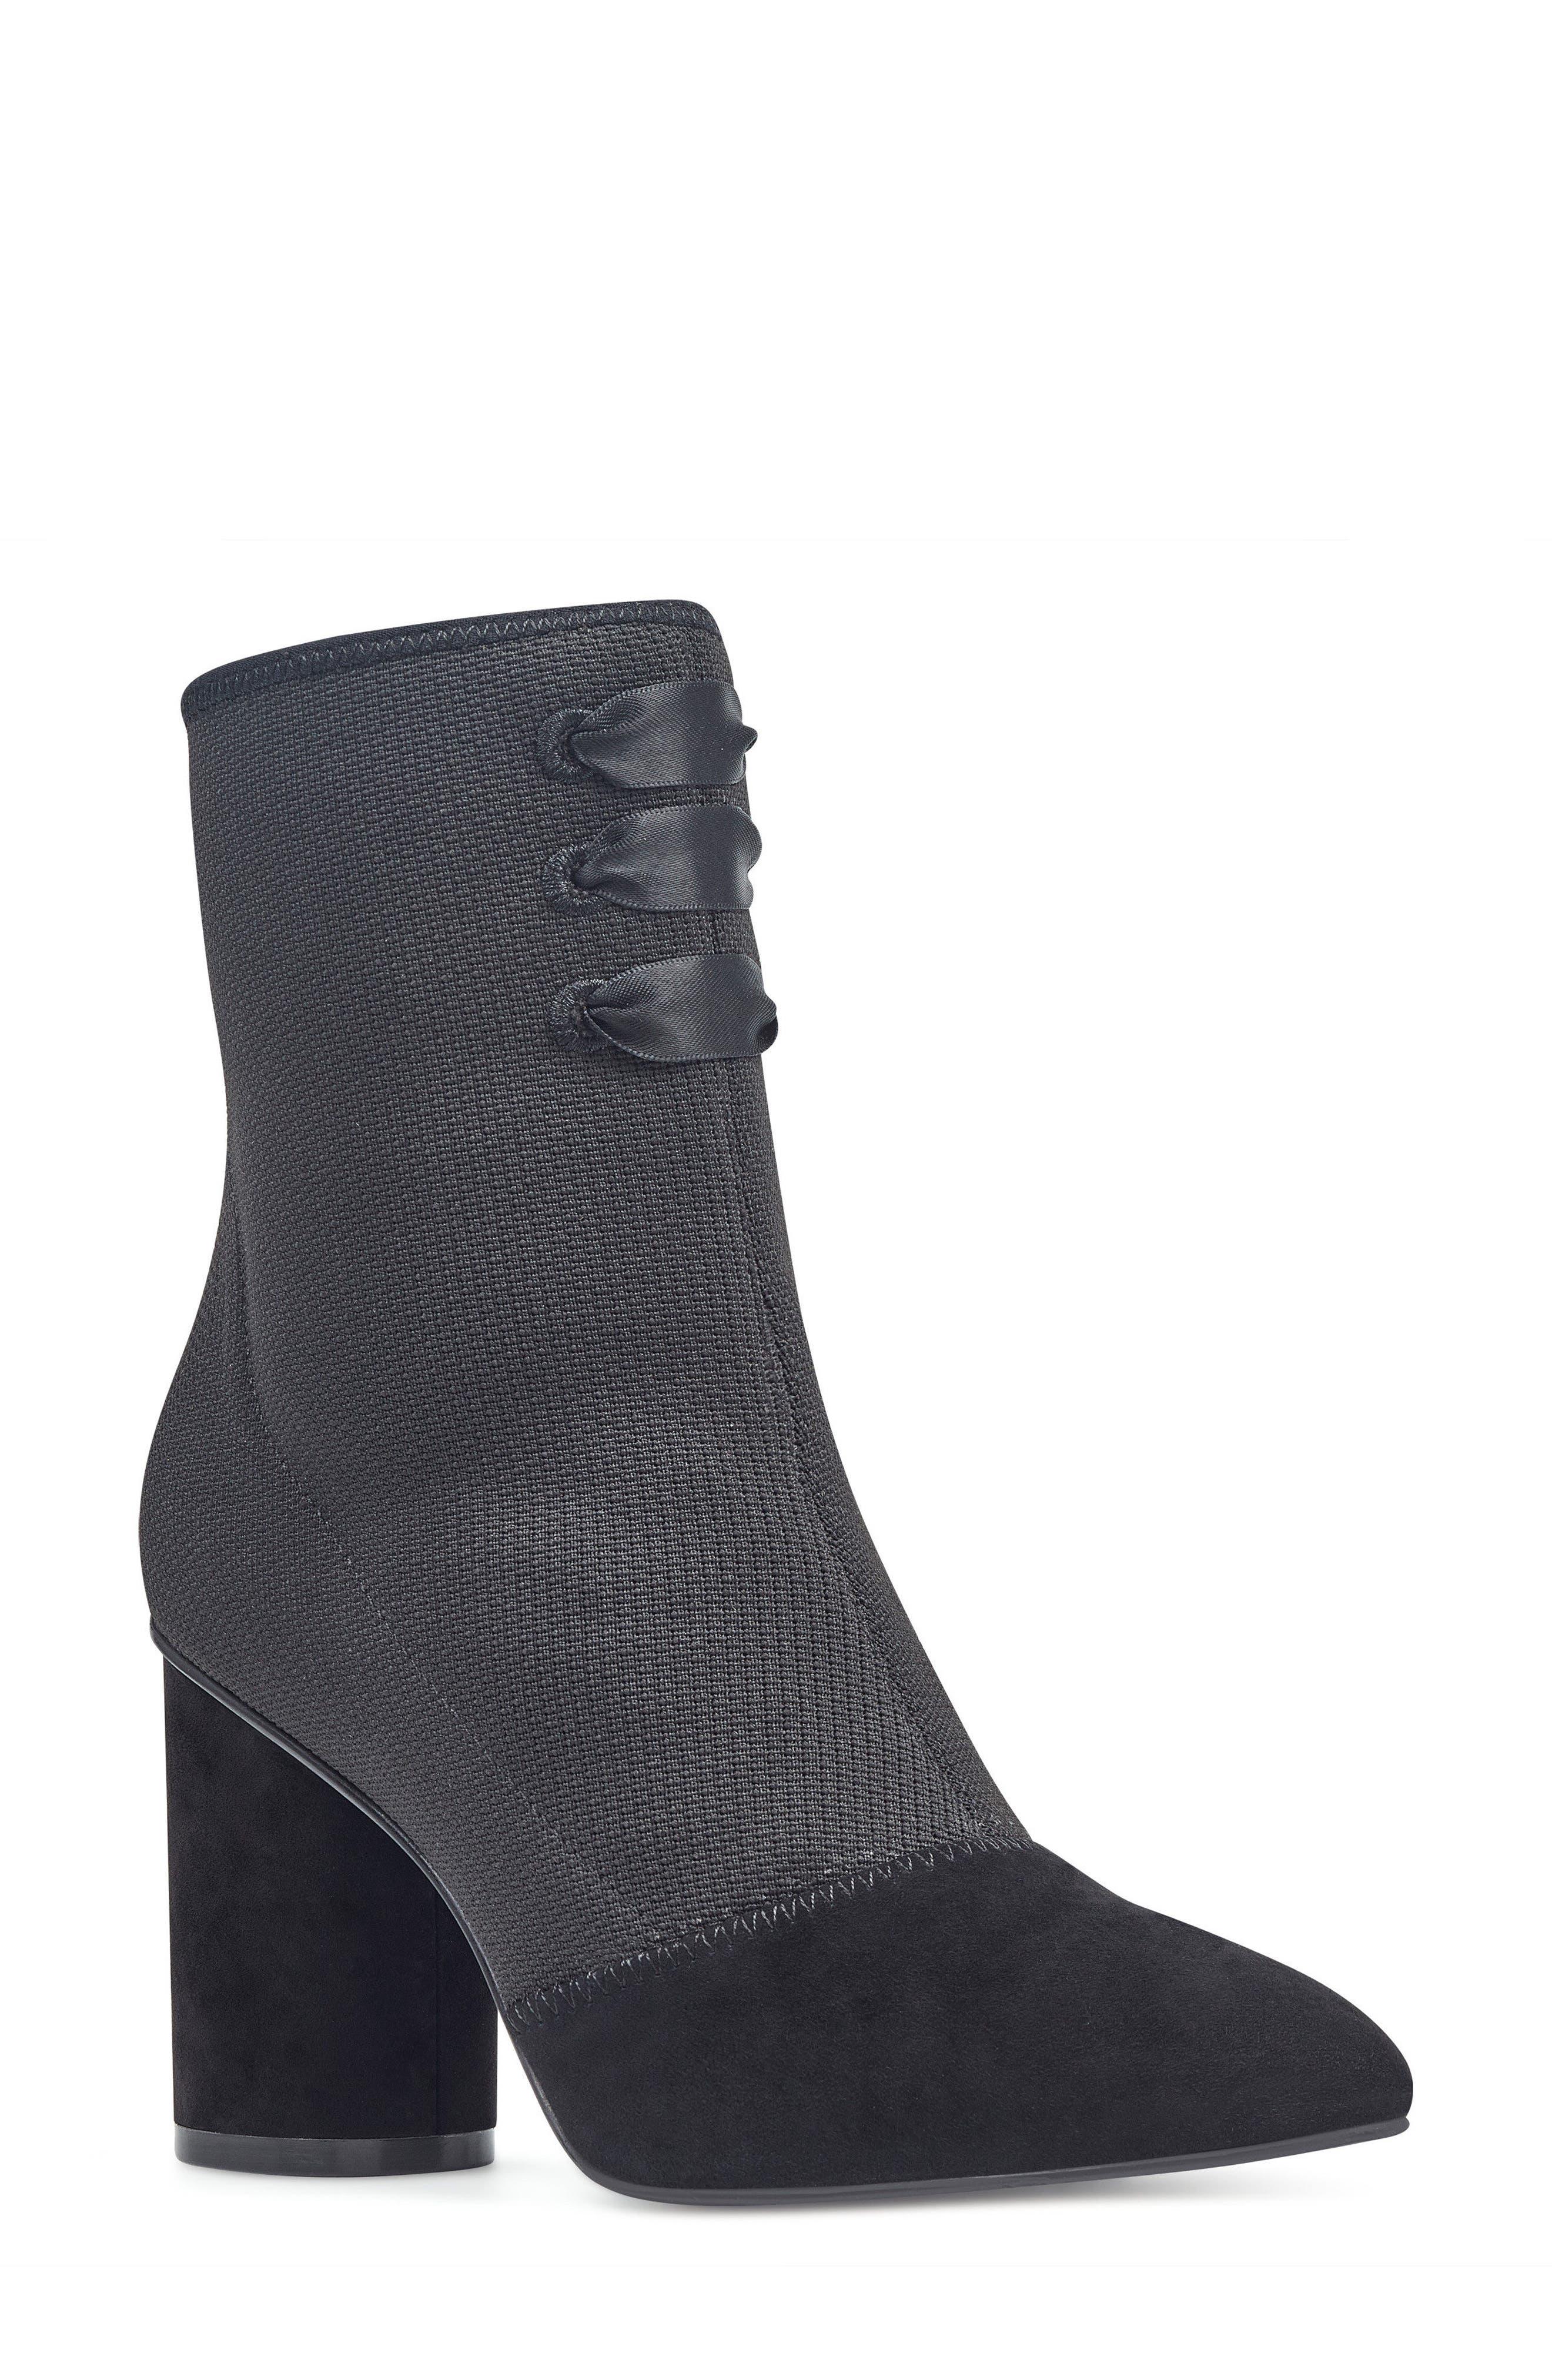 Carolina Pointy Toe Bootie,                         Main,                         color, Black Multi Fabric